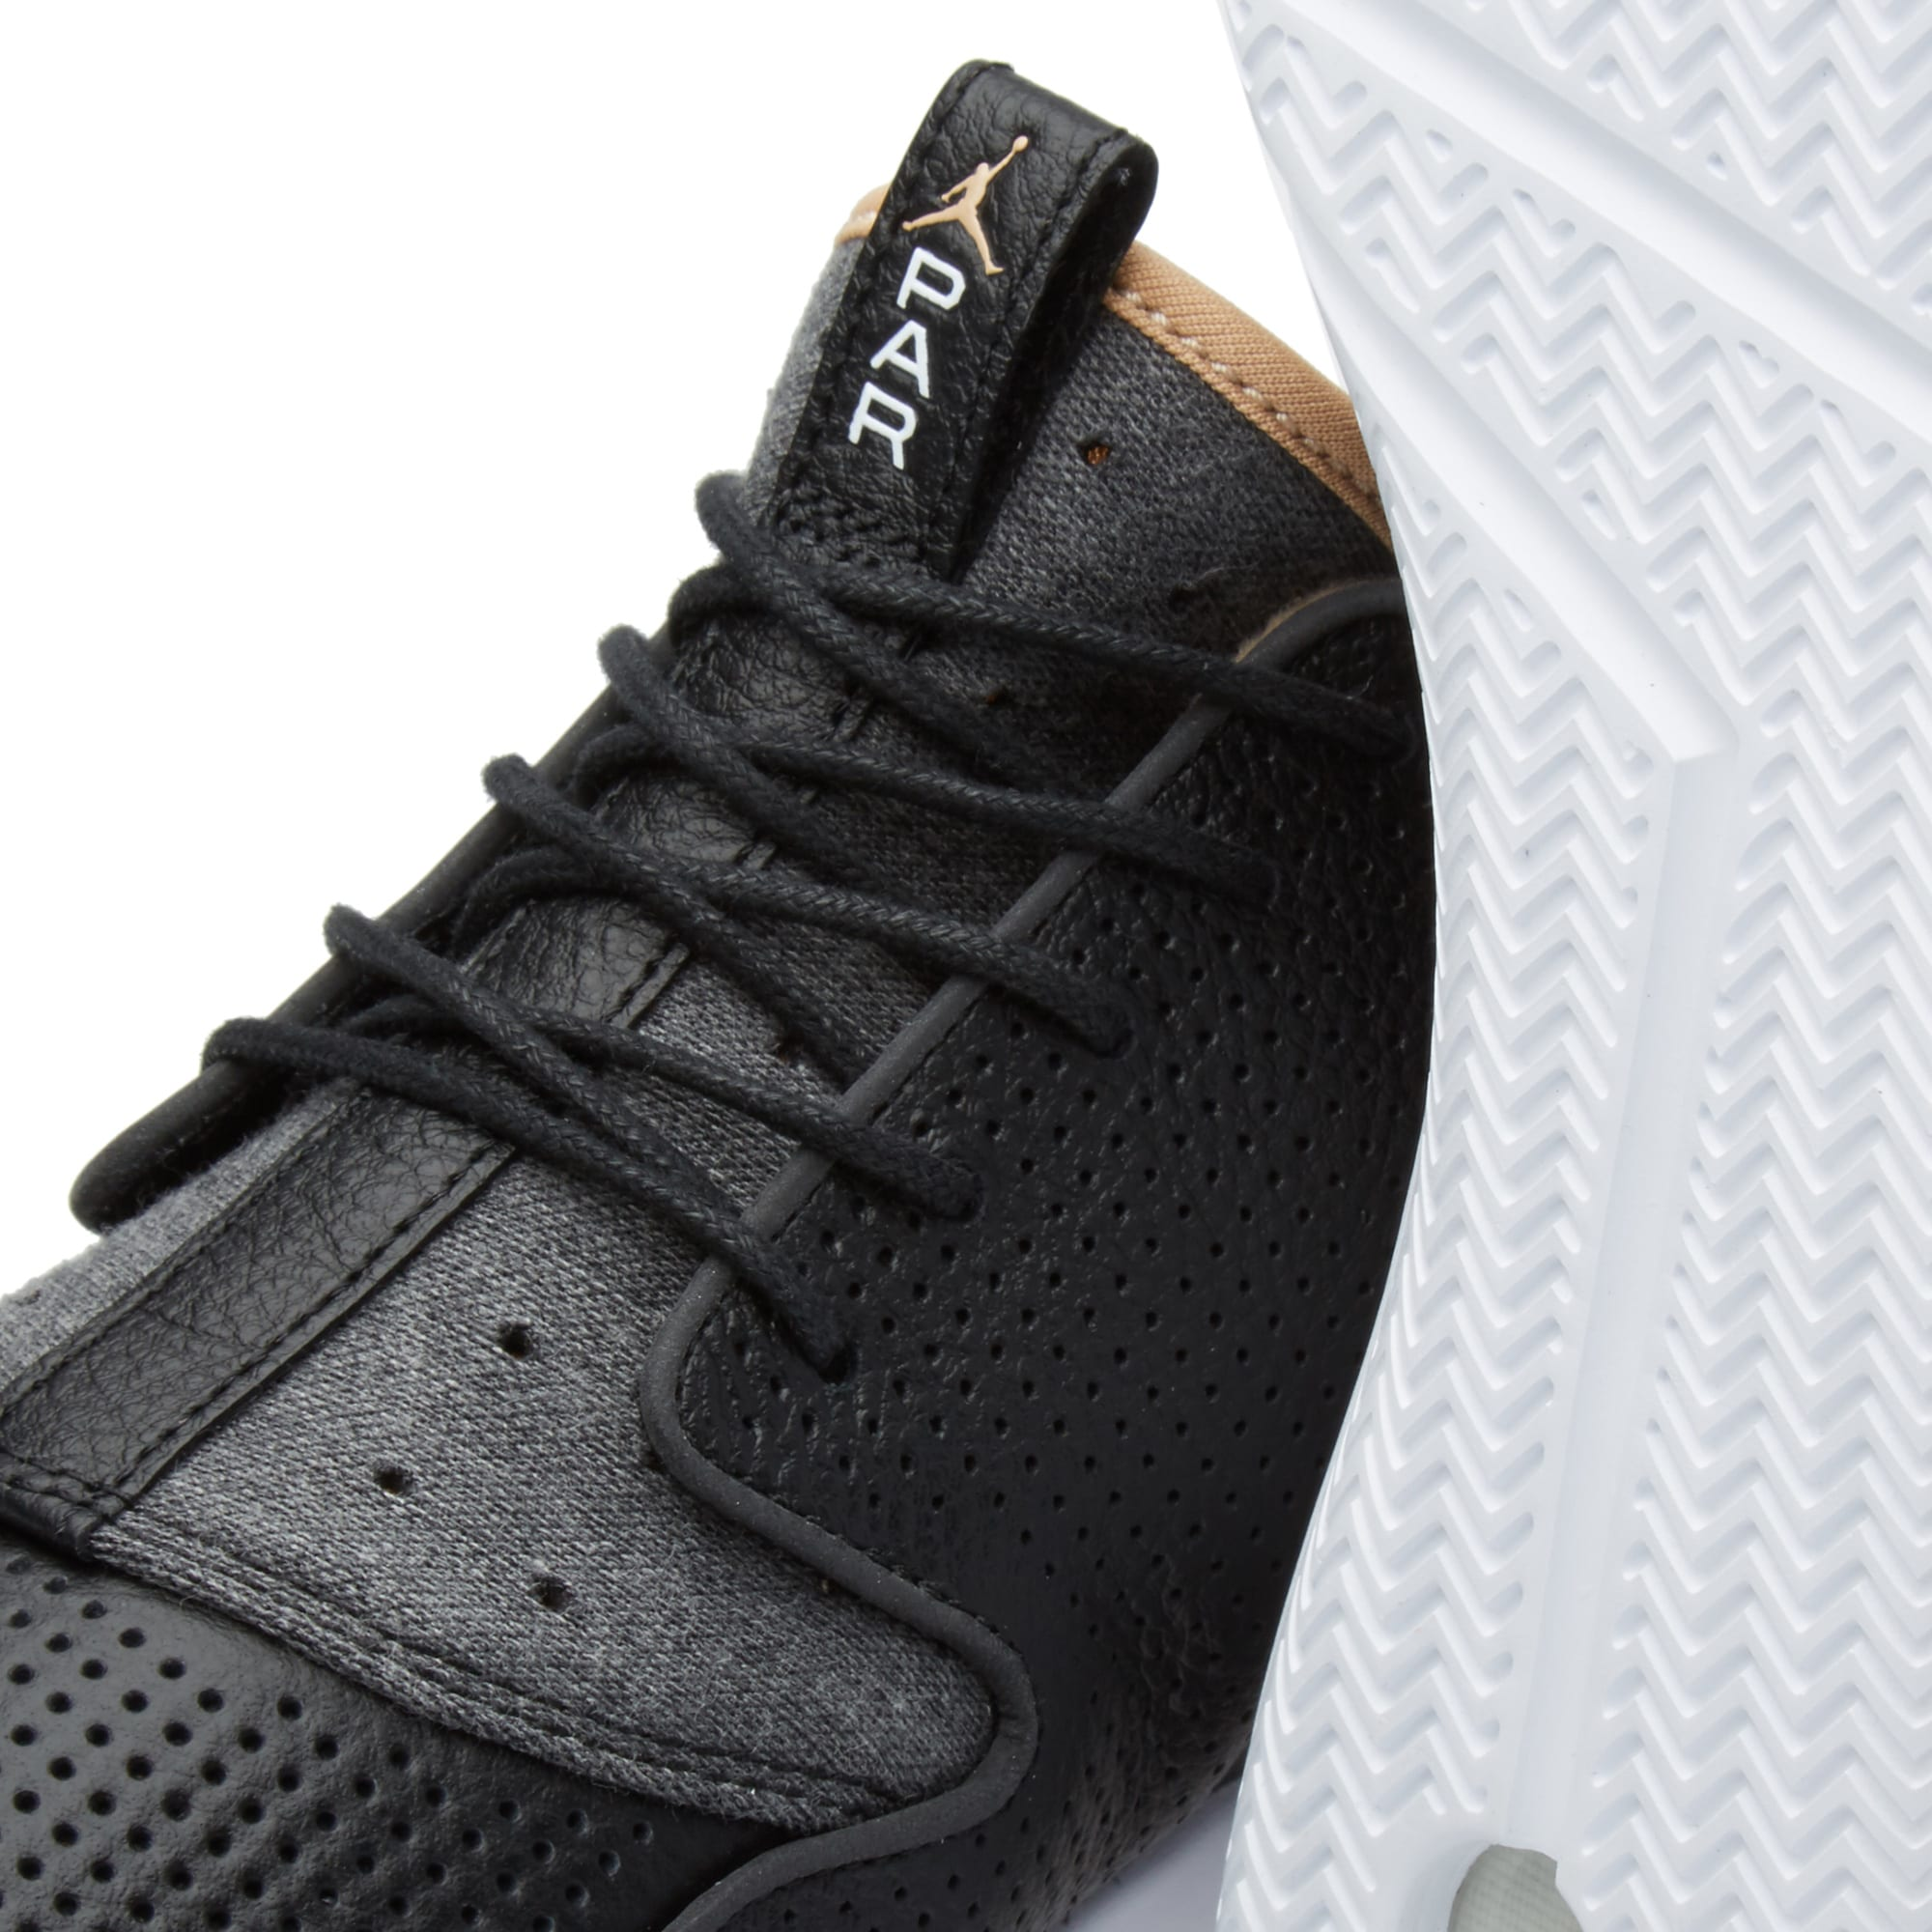 a8e8254ad80bf1 Nike Jordan Eclipse Leather  Paris  Black